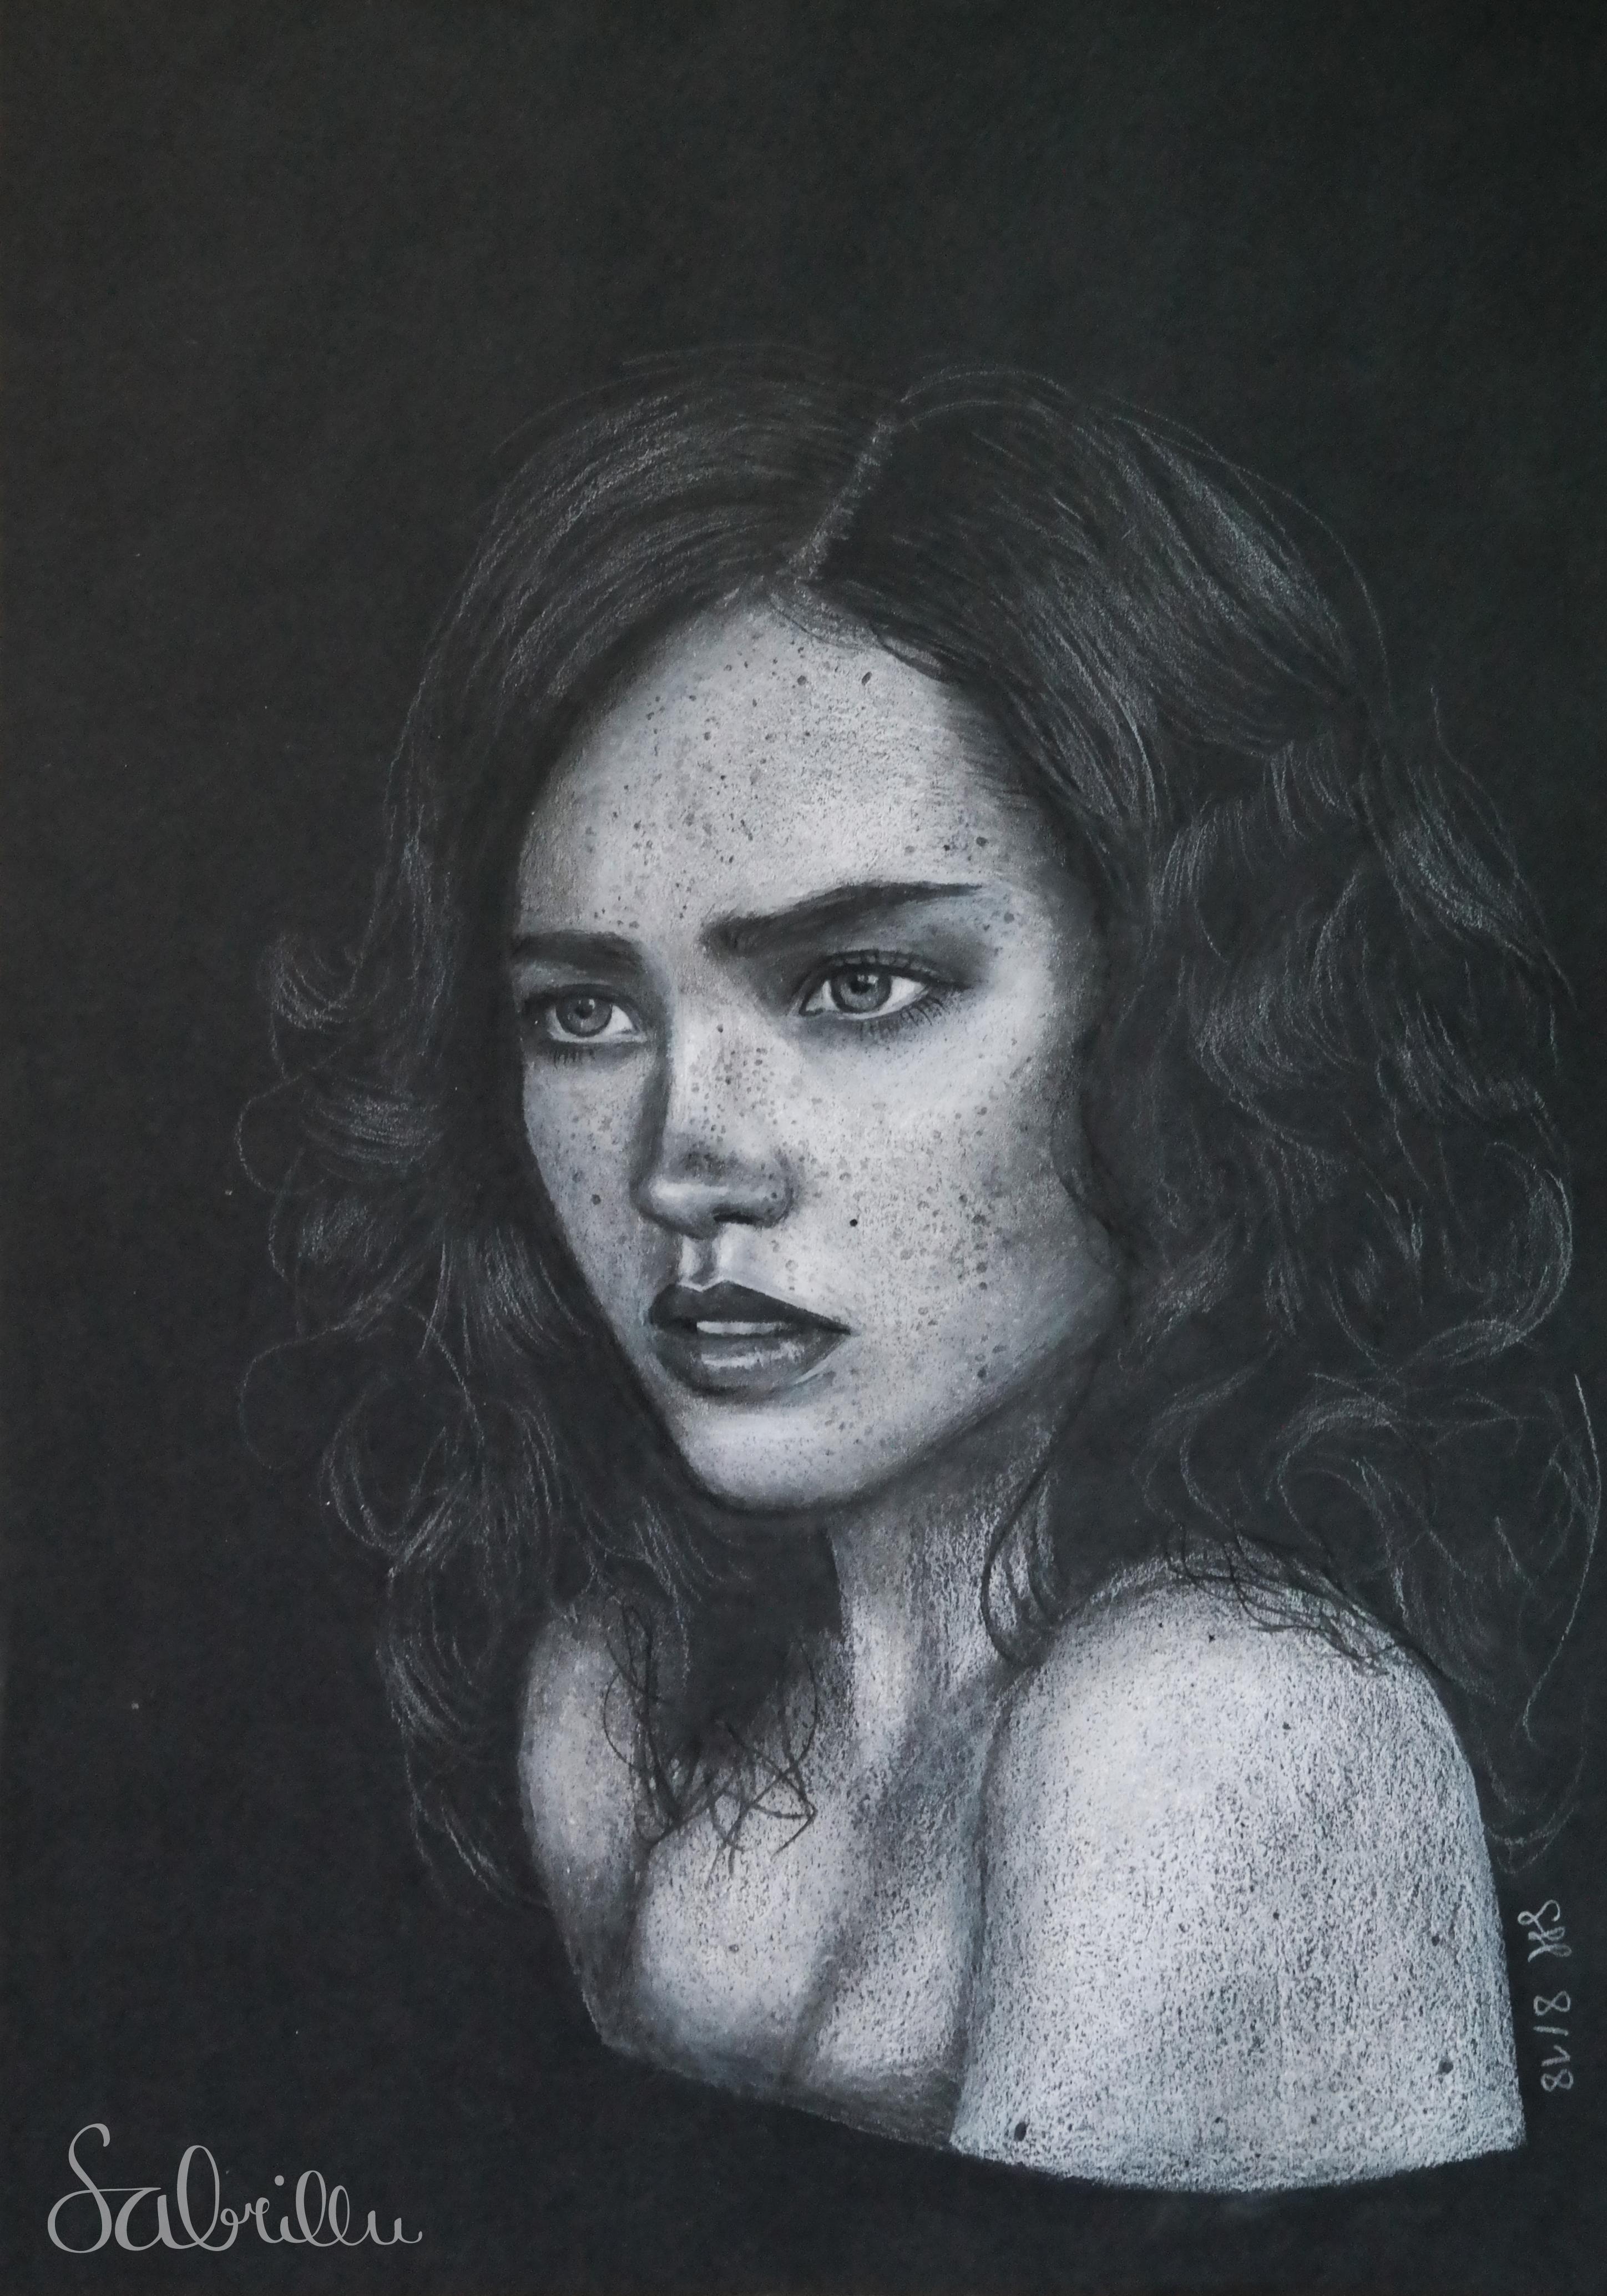 chalk drawing on black paper by Sabrillu